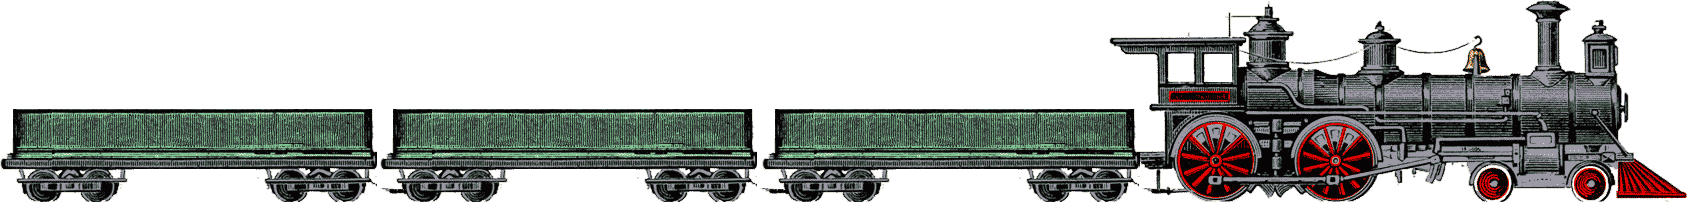 Tren con vagones